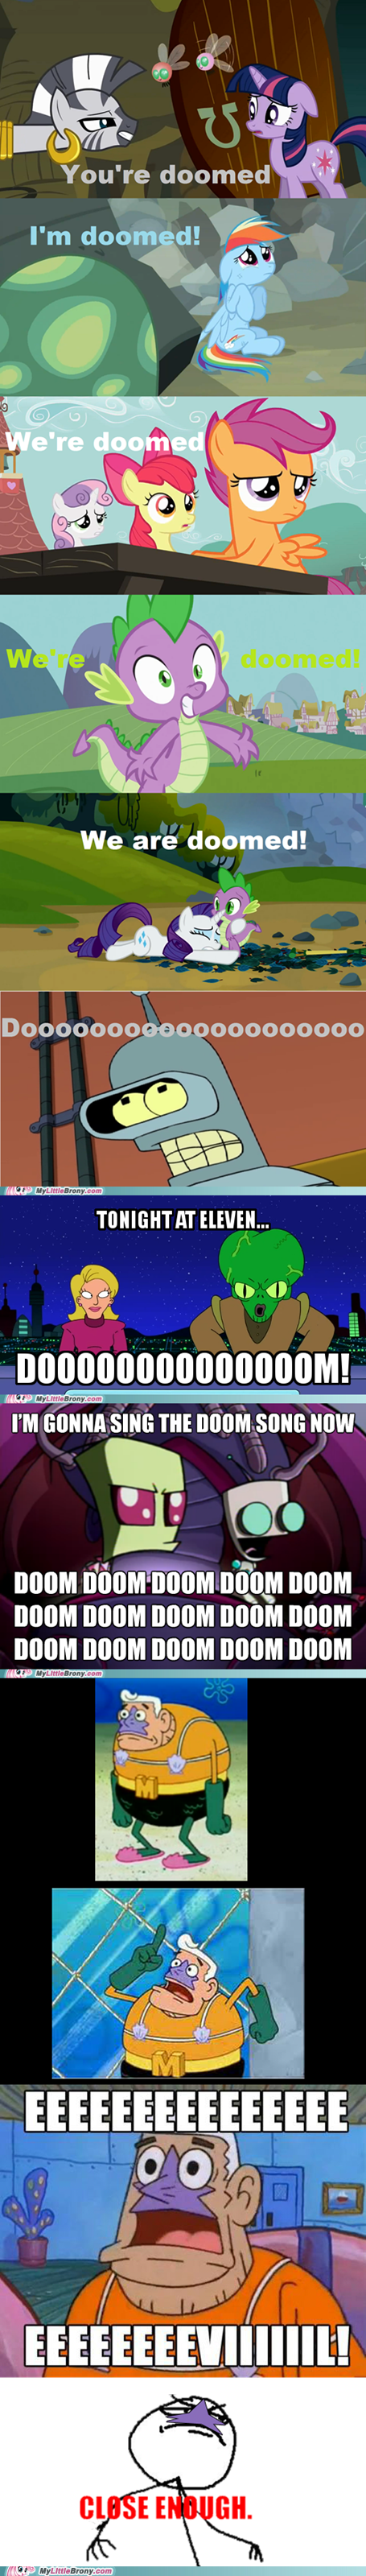 Doom?